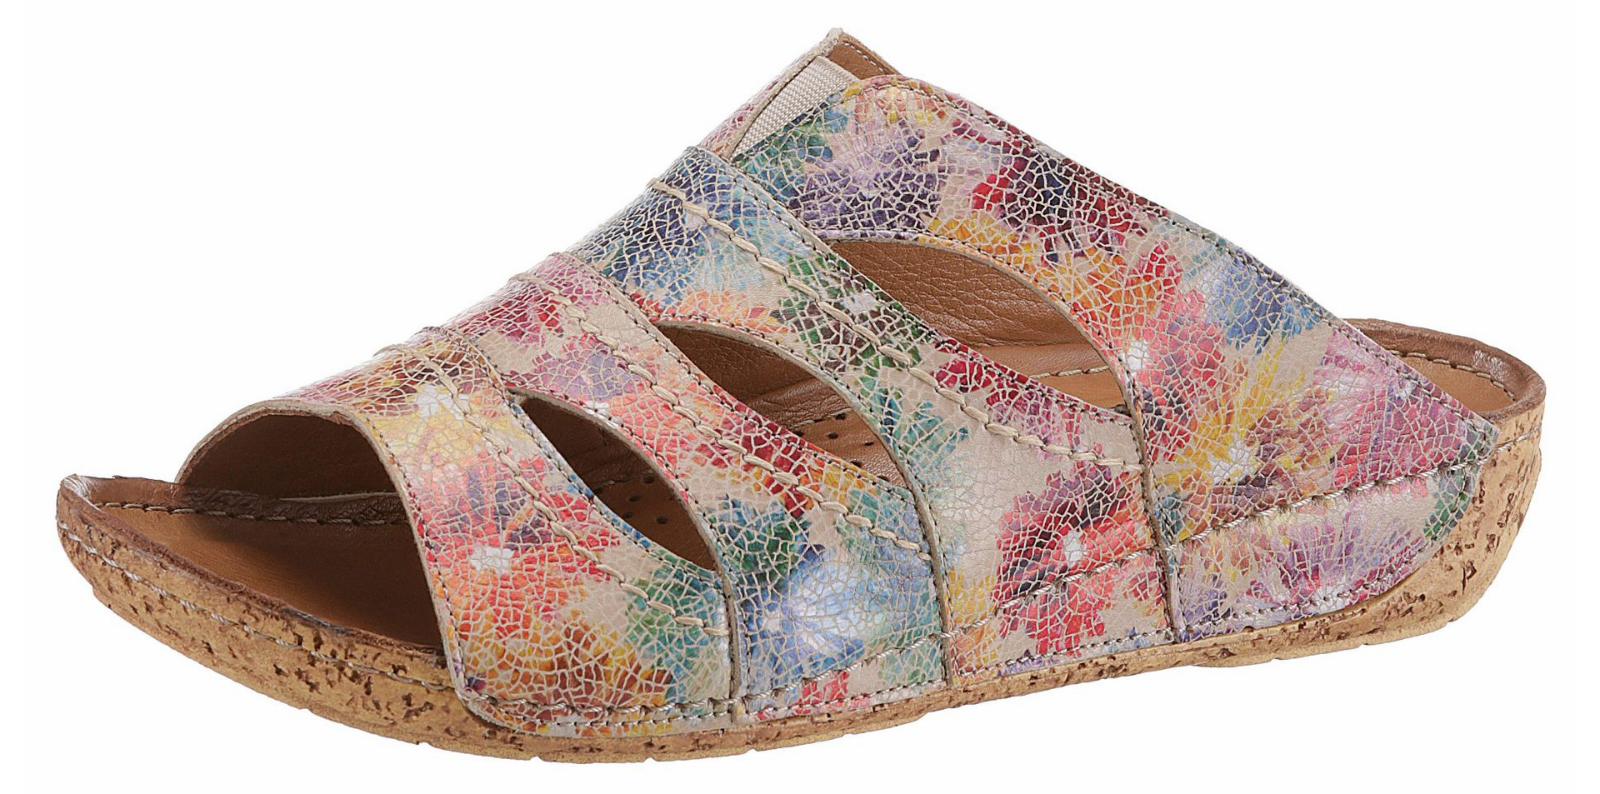 Gemini Damen Pantolette multi Gr.41 Leder Schuhe  Clogs  NEU